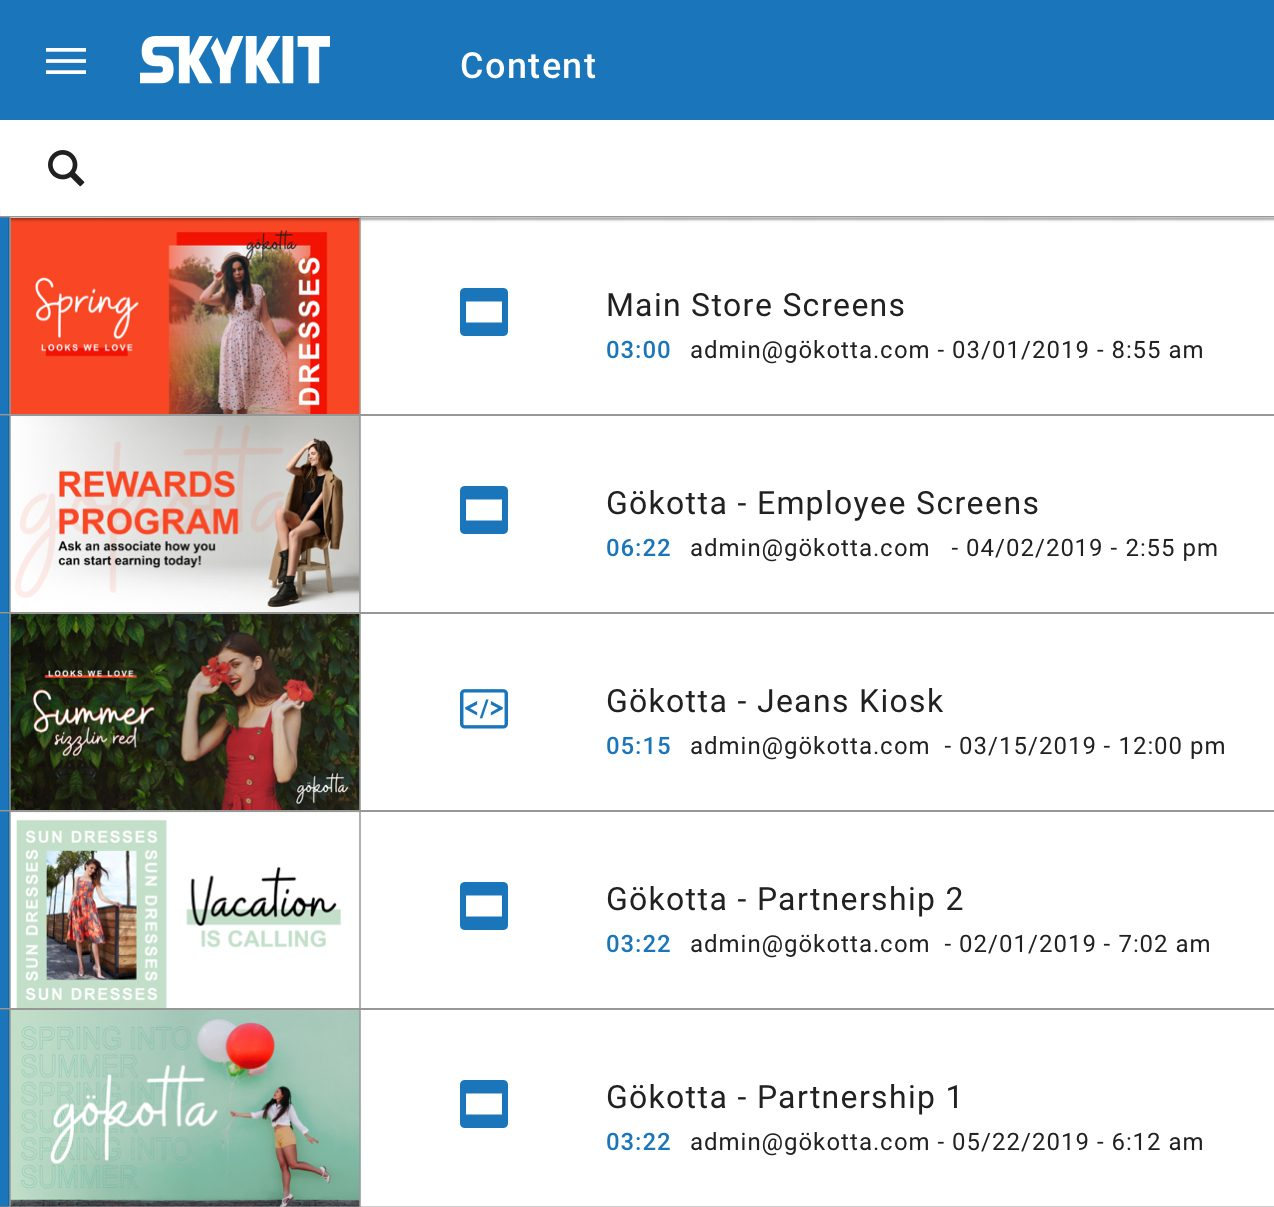 skykit digital signage content optons